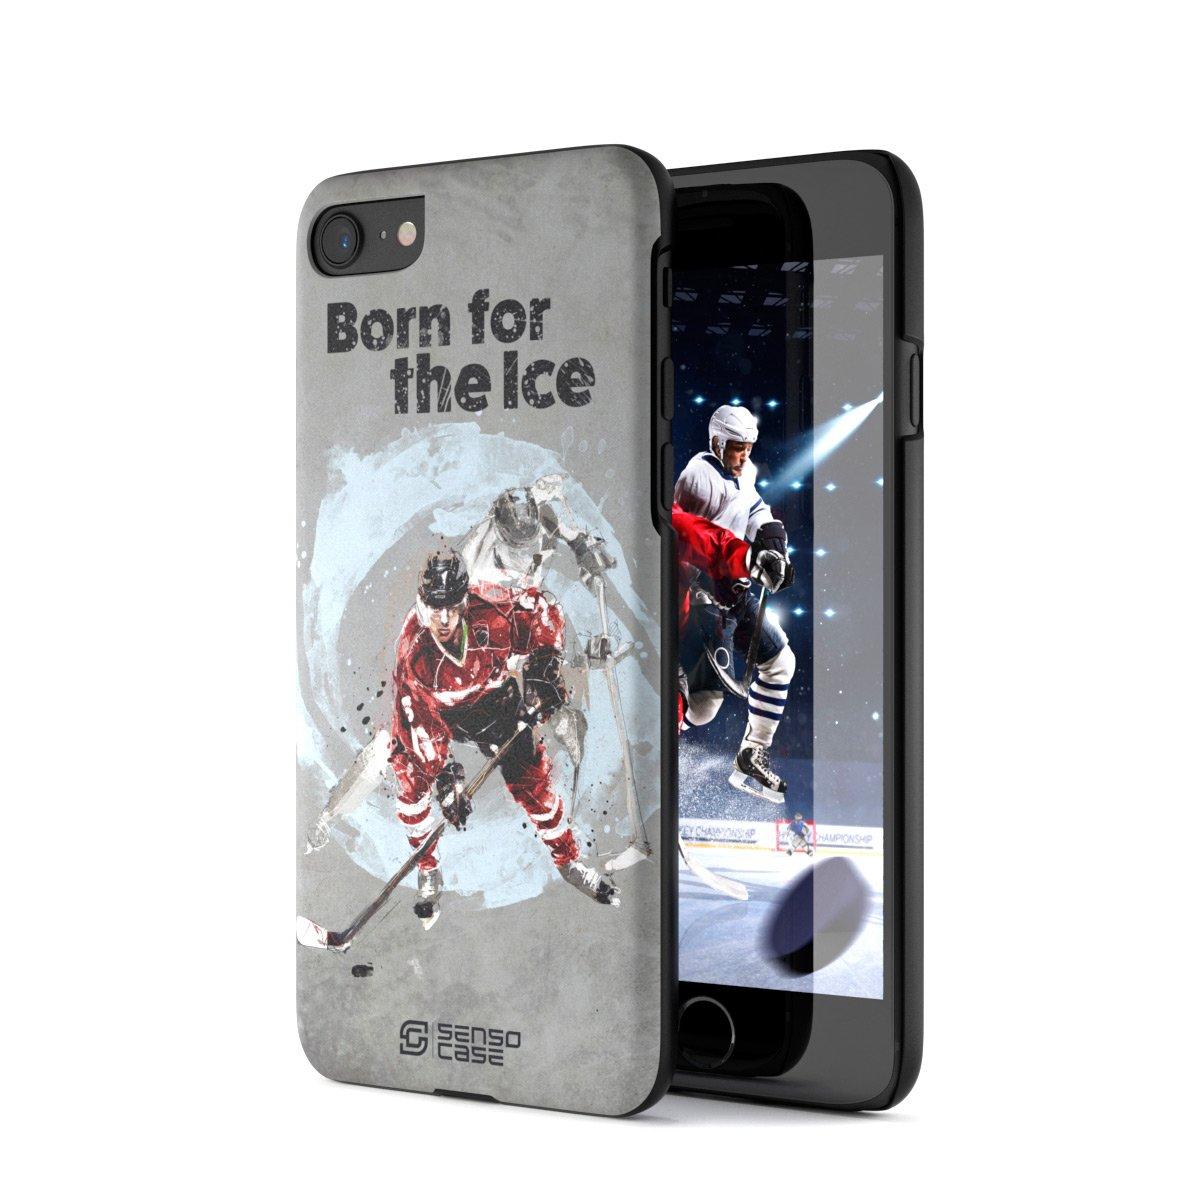 iPhone 7/8 Case, Born For Hockey. Sensocase Premium Extreme Sports Unique Designer Tough Shell Thin Cover. Luxury, Anti-Fingerprint, Anti-Scratch Stylish Slim Protective Apple Phone Case. by SENSOCASE